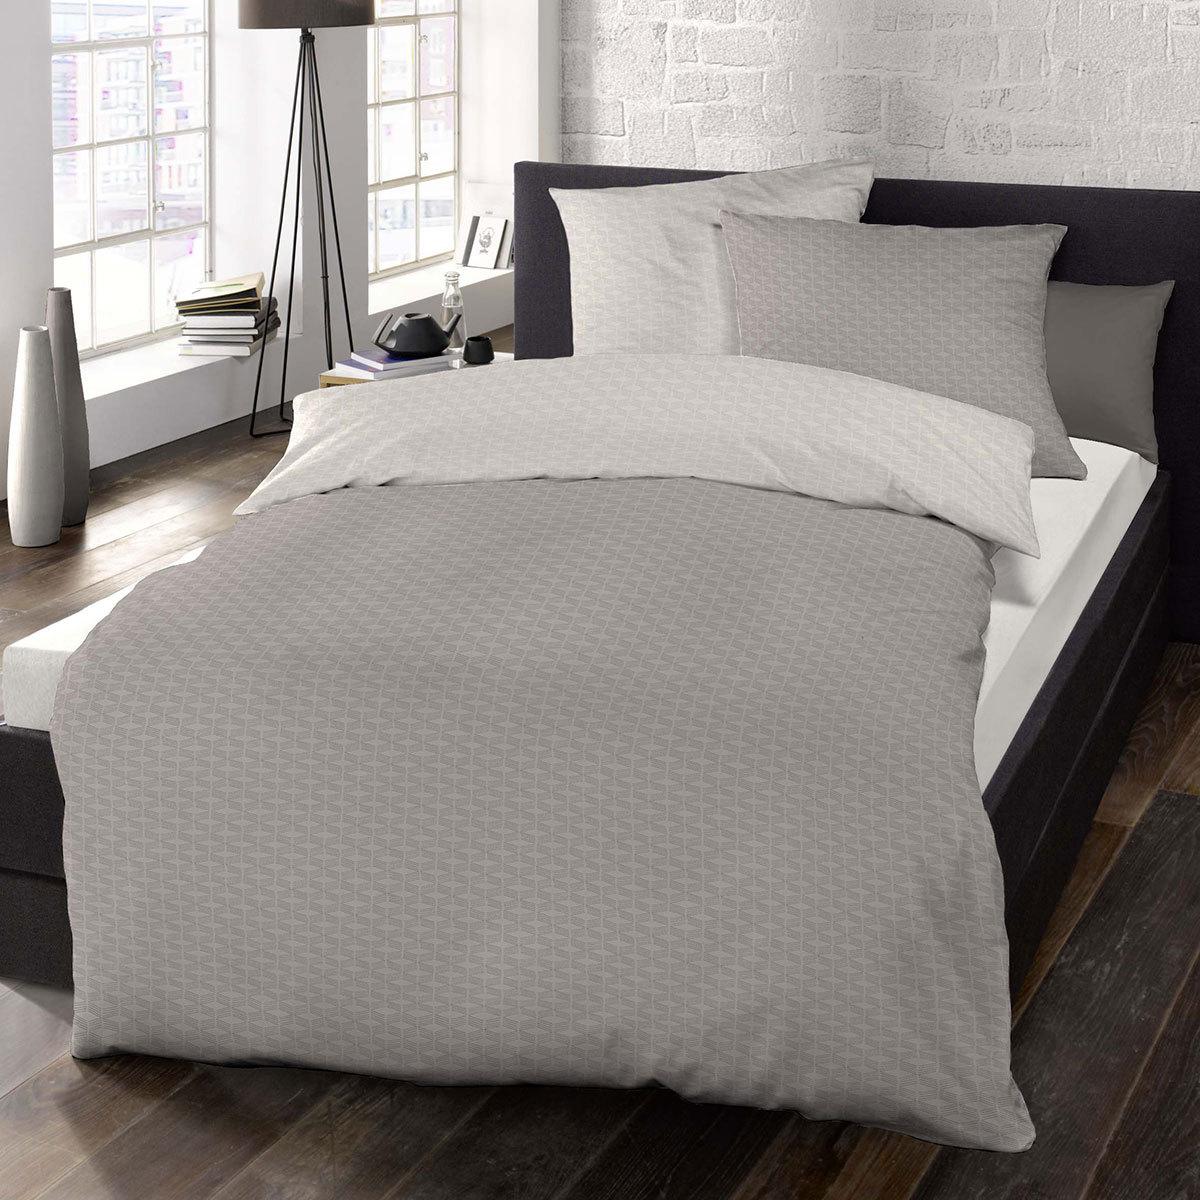 schlafgut mako satin bettw sche negro kakao g nstig online kaufen bei bettwaren shop. Black Bedroom Furniture Sets. Home Design Ideas